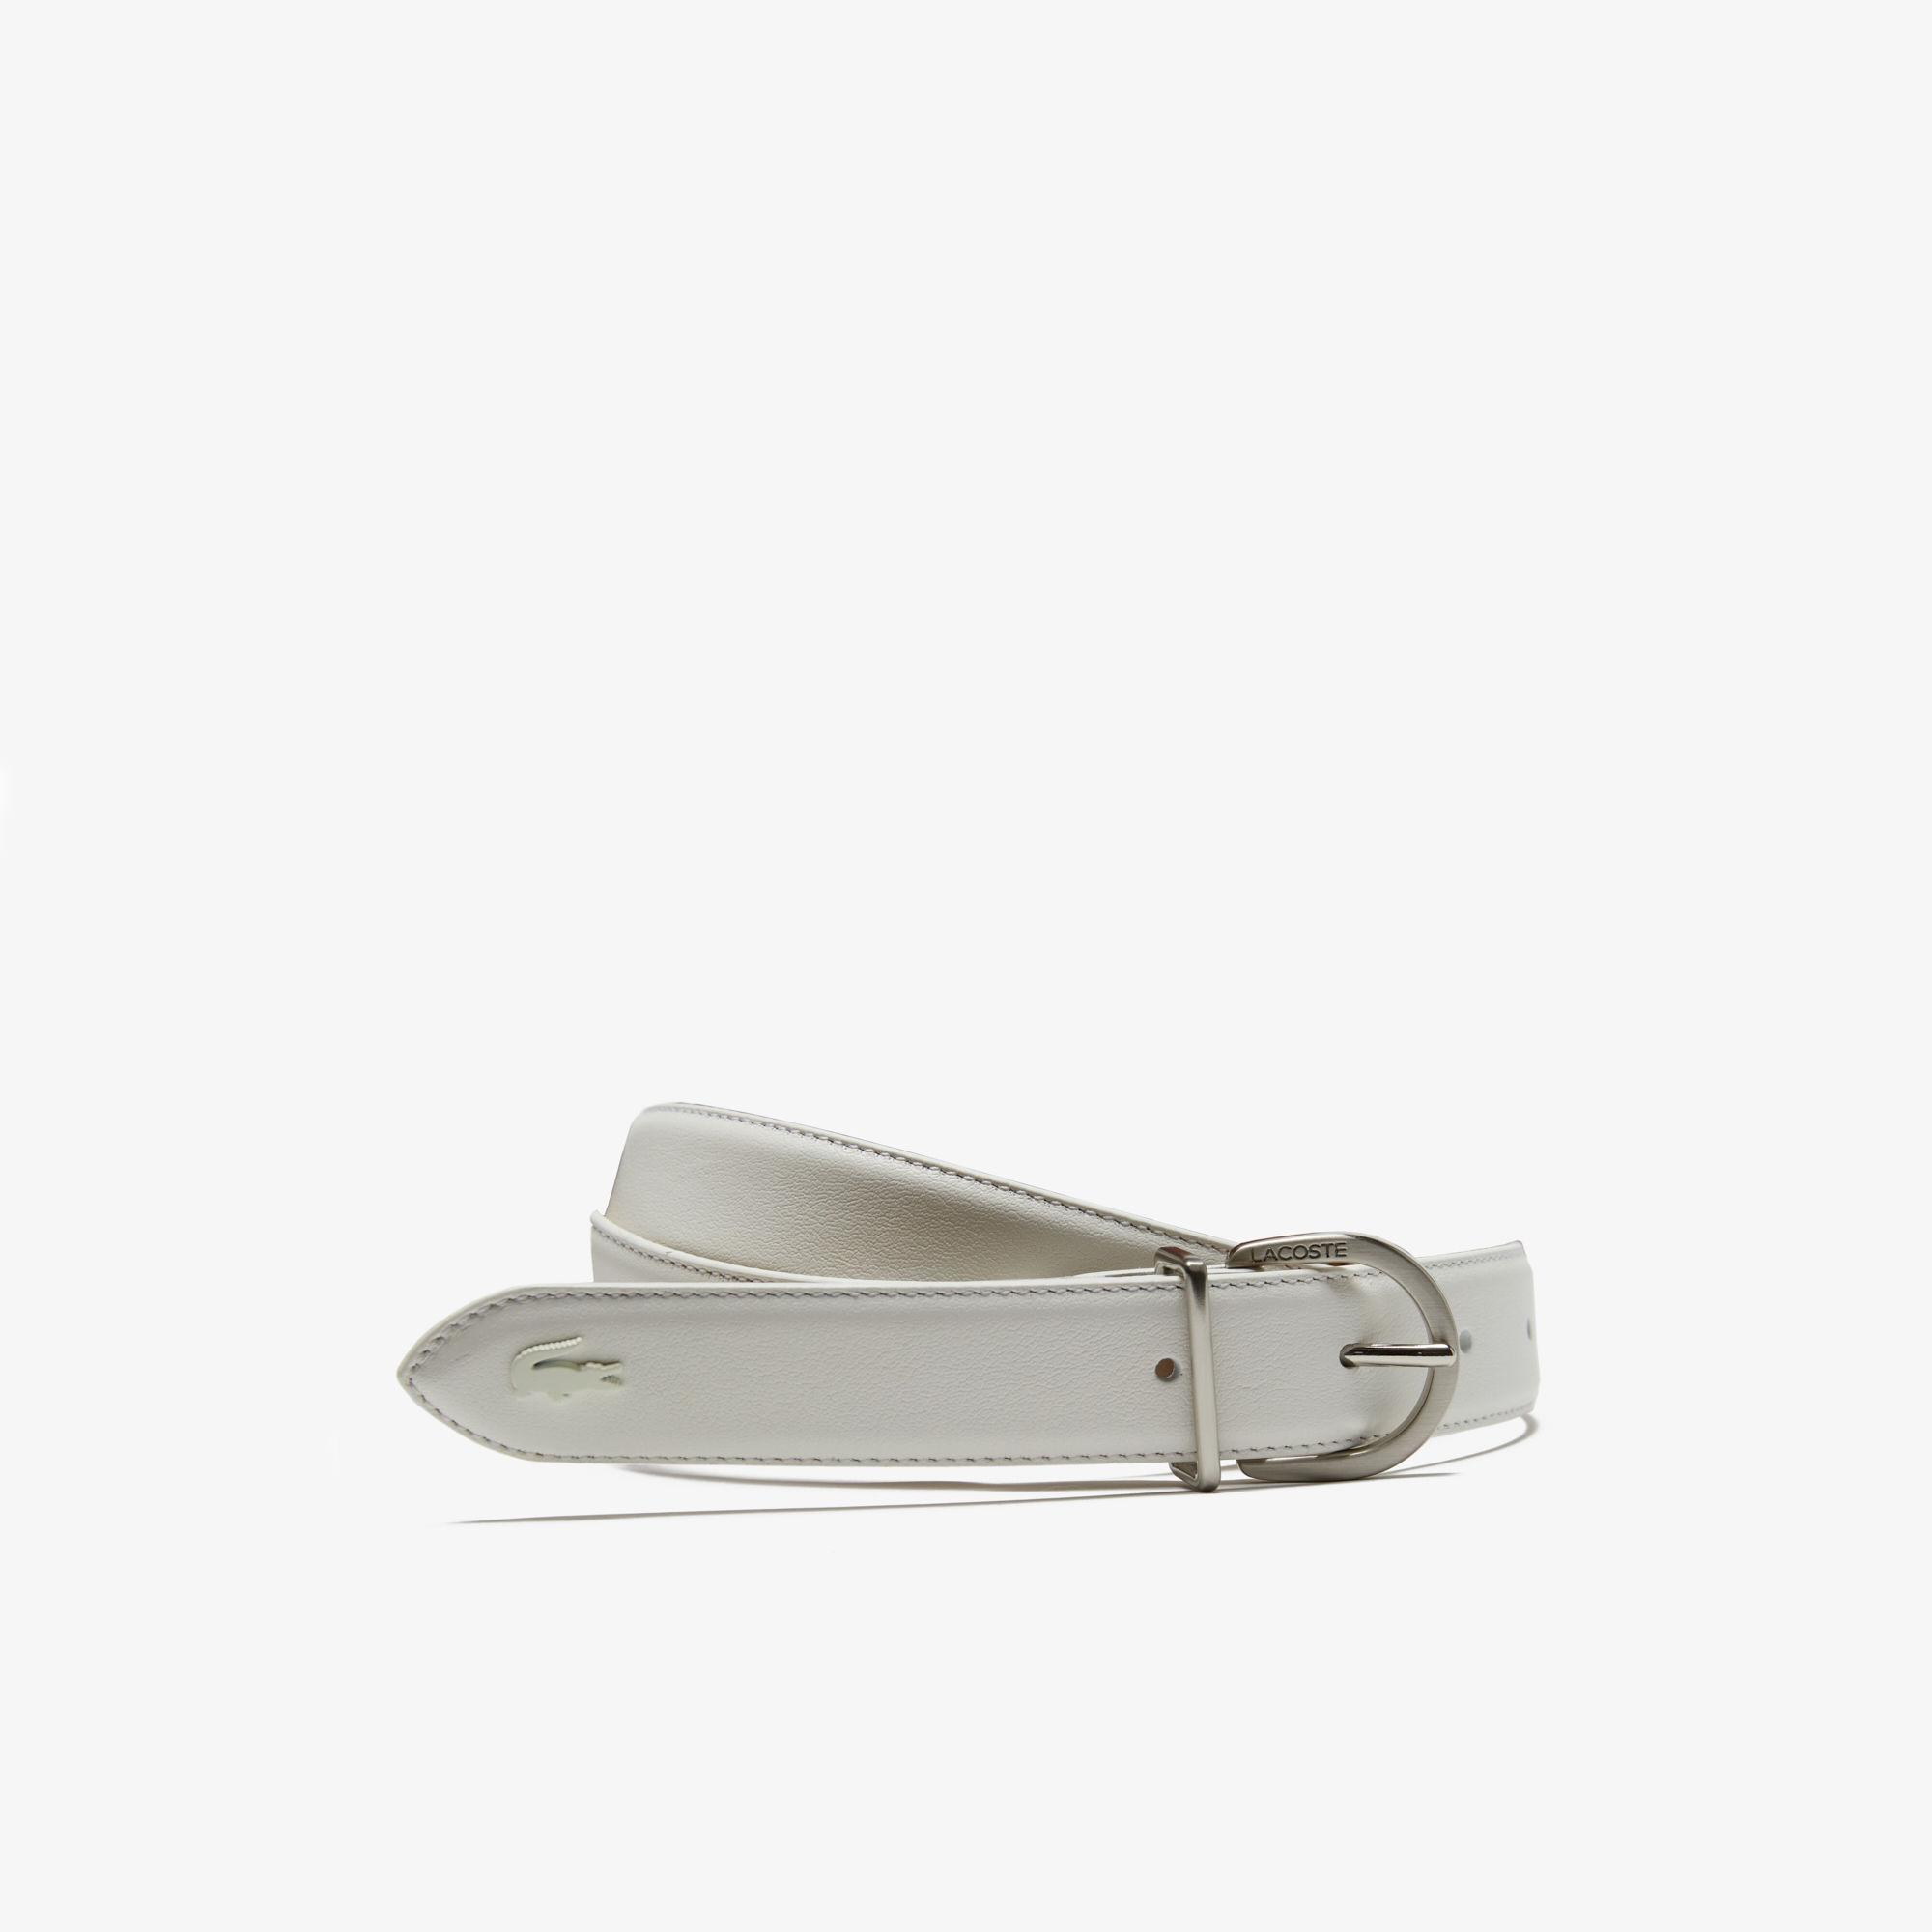 665edfb52fd36 Lacoste. Women s L.12.12 Engraved Tongue Buckle Leather Belt